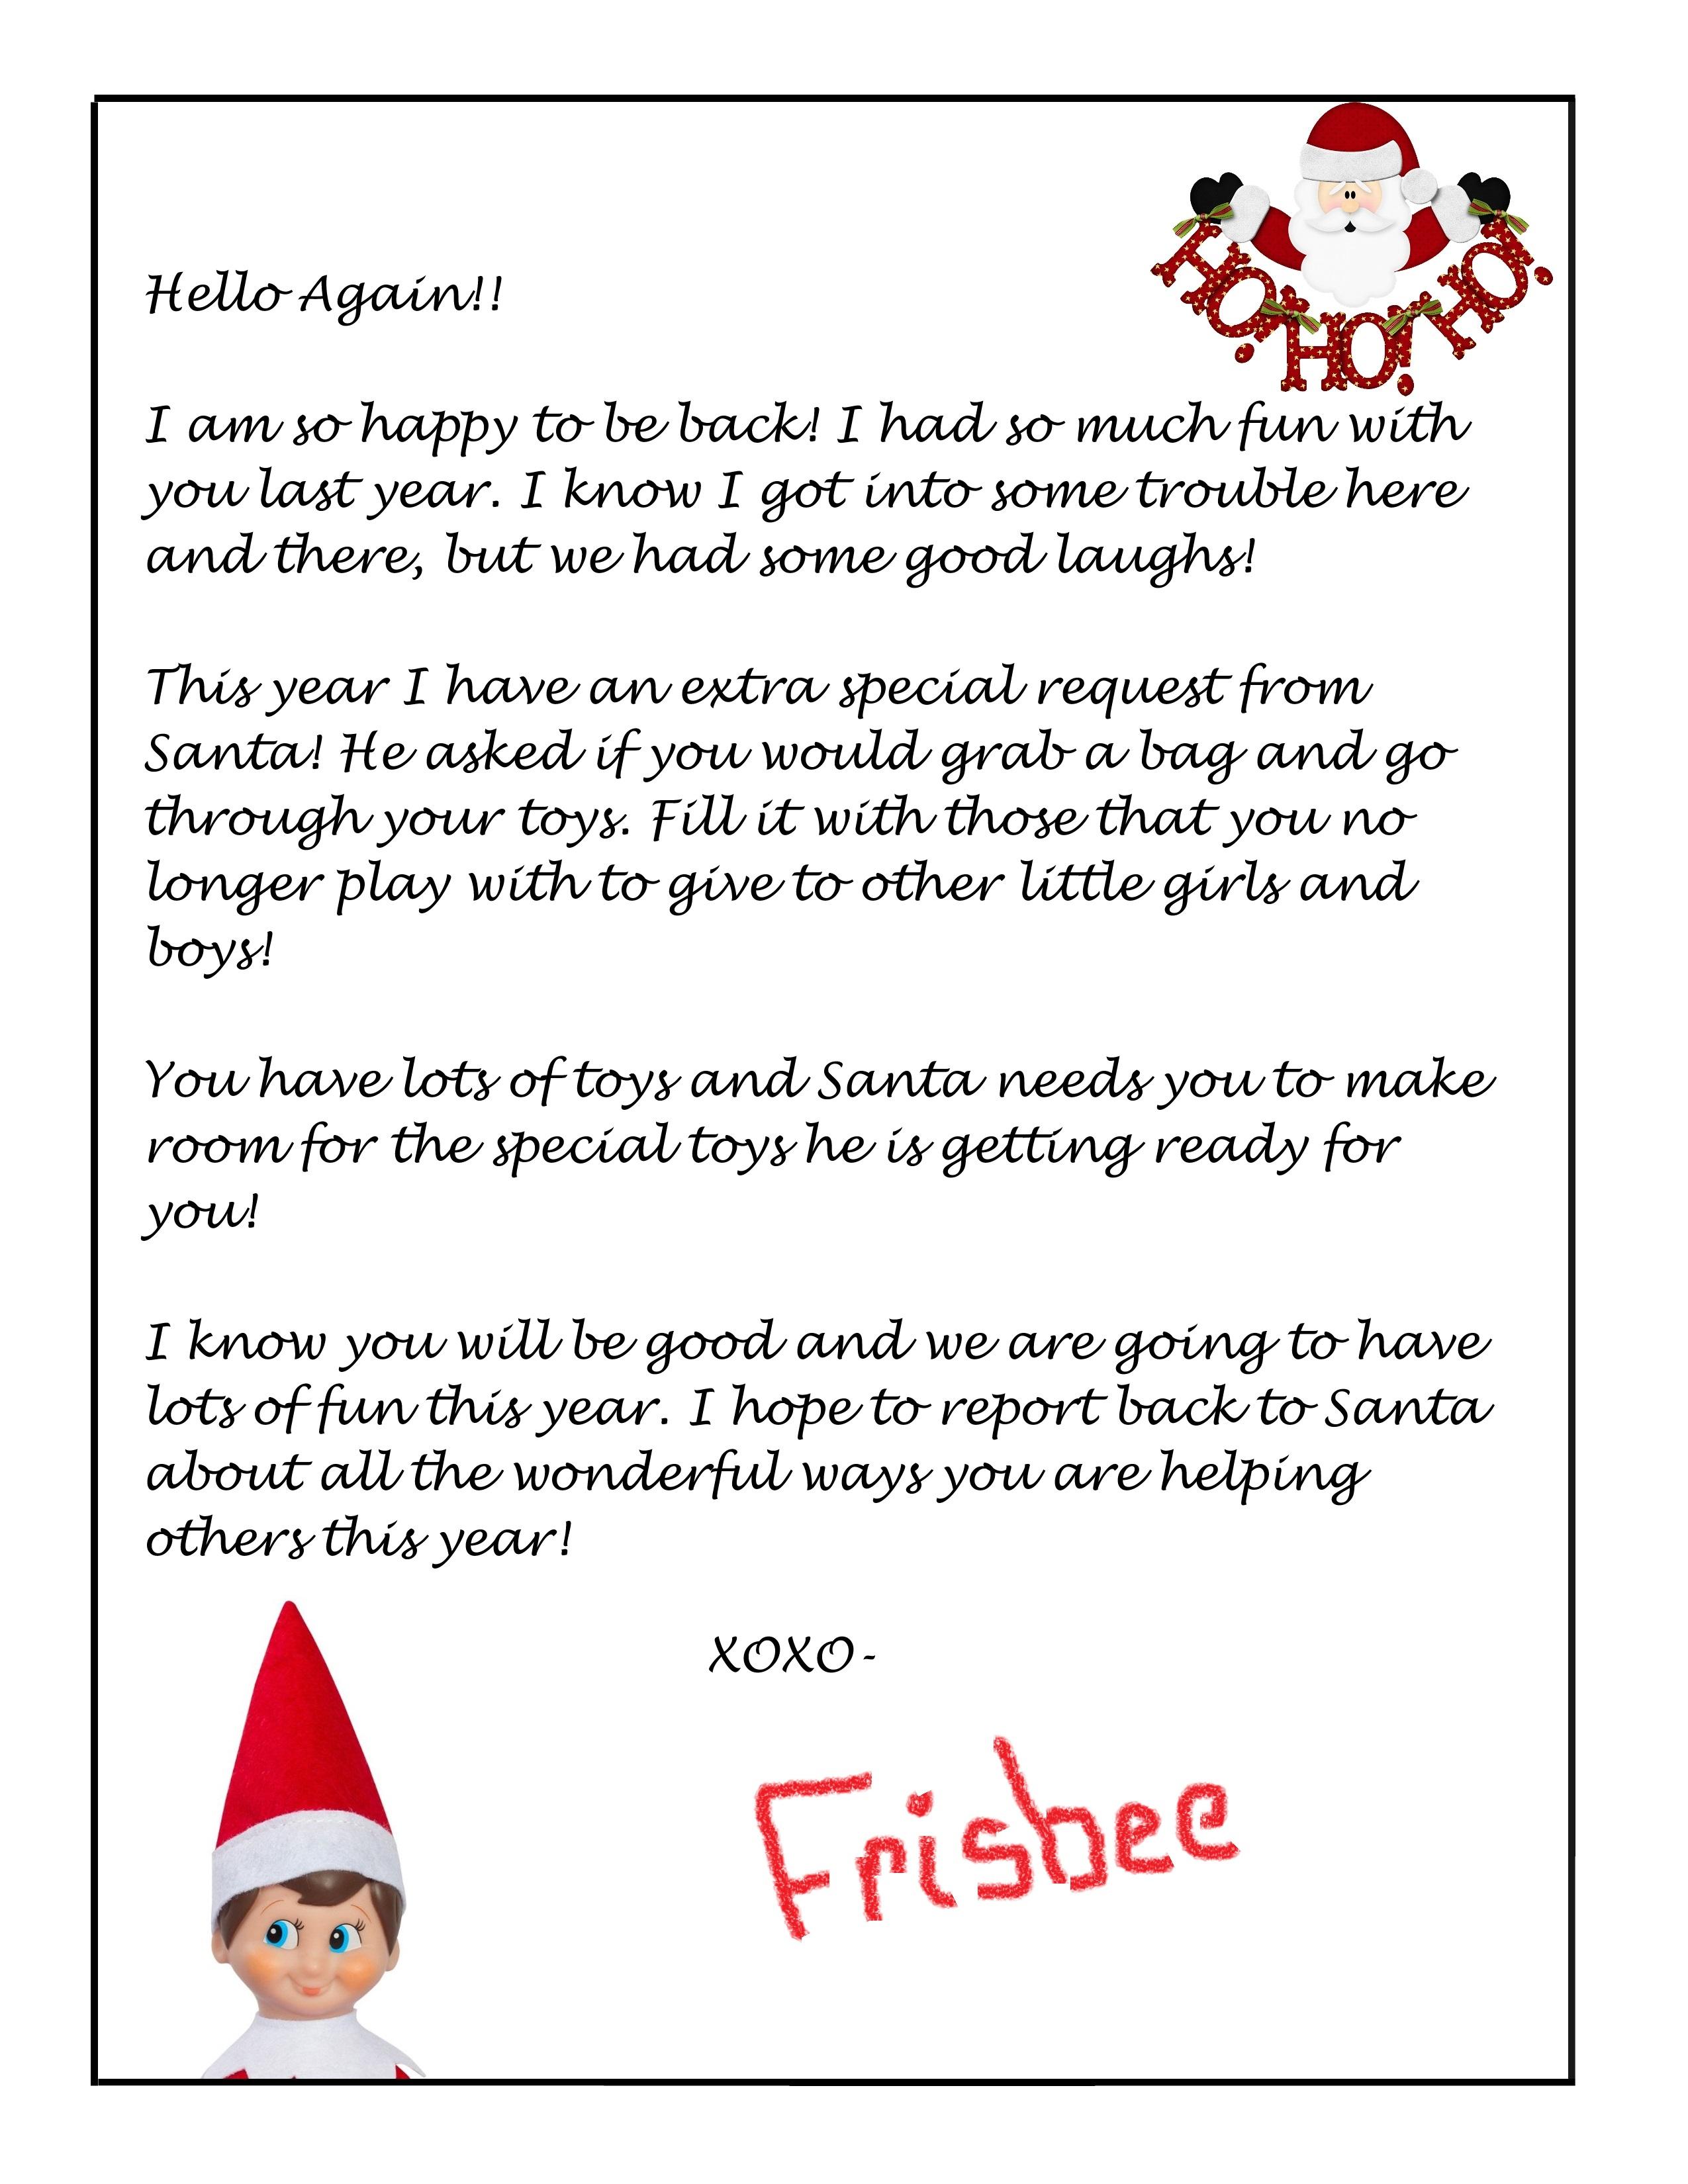 Elf On The Shelf Free Donation Letter Printable - Printables 4 Mom - Free Printable Elf On The Shelf Letter